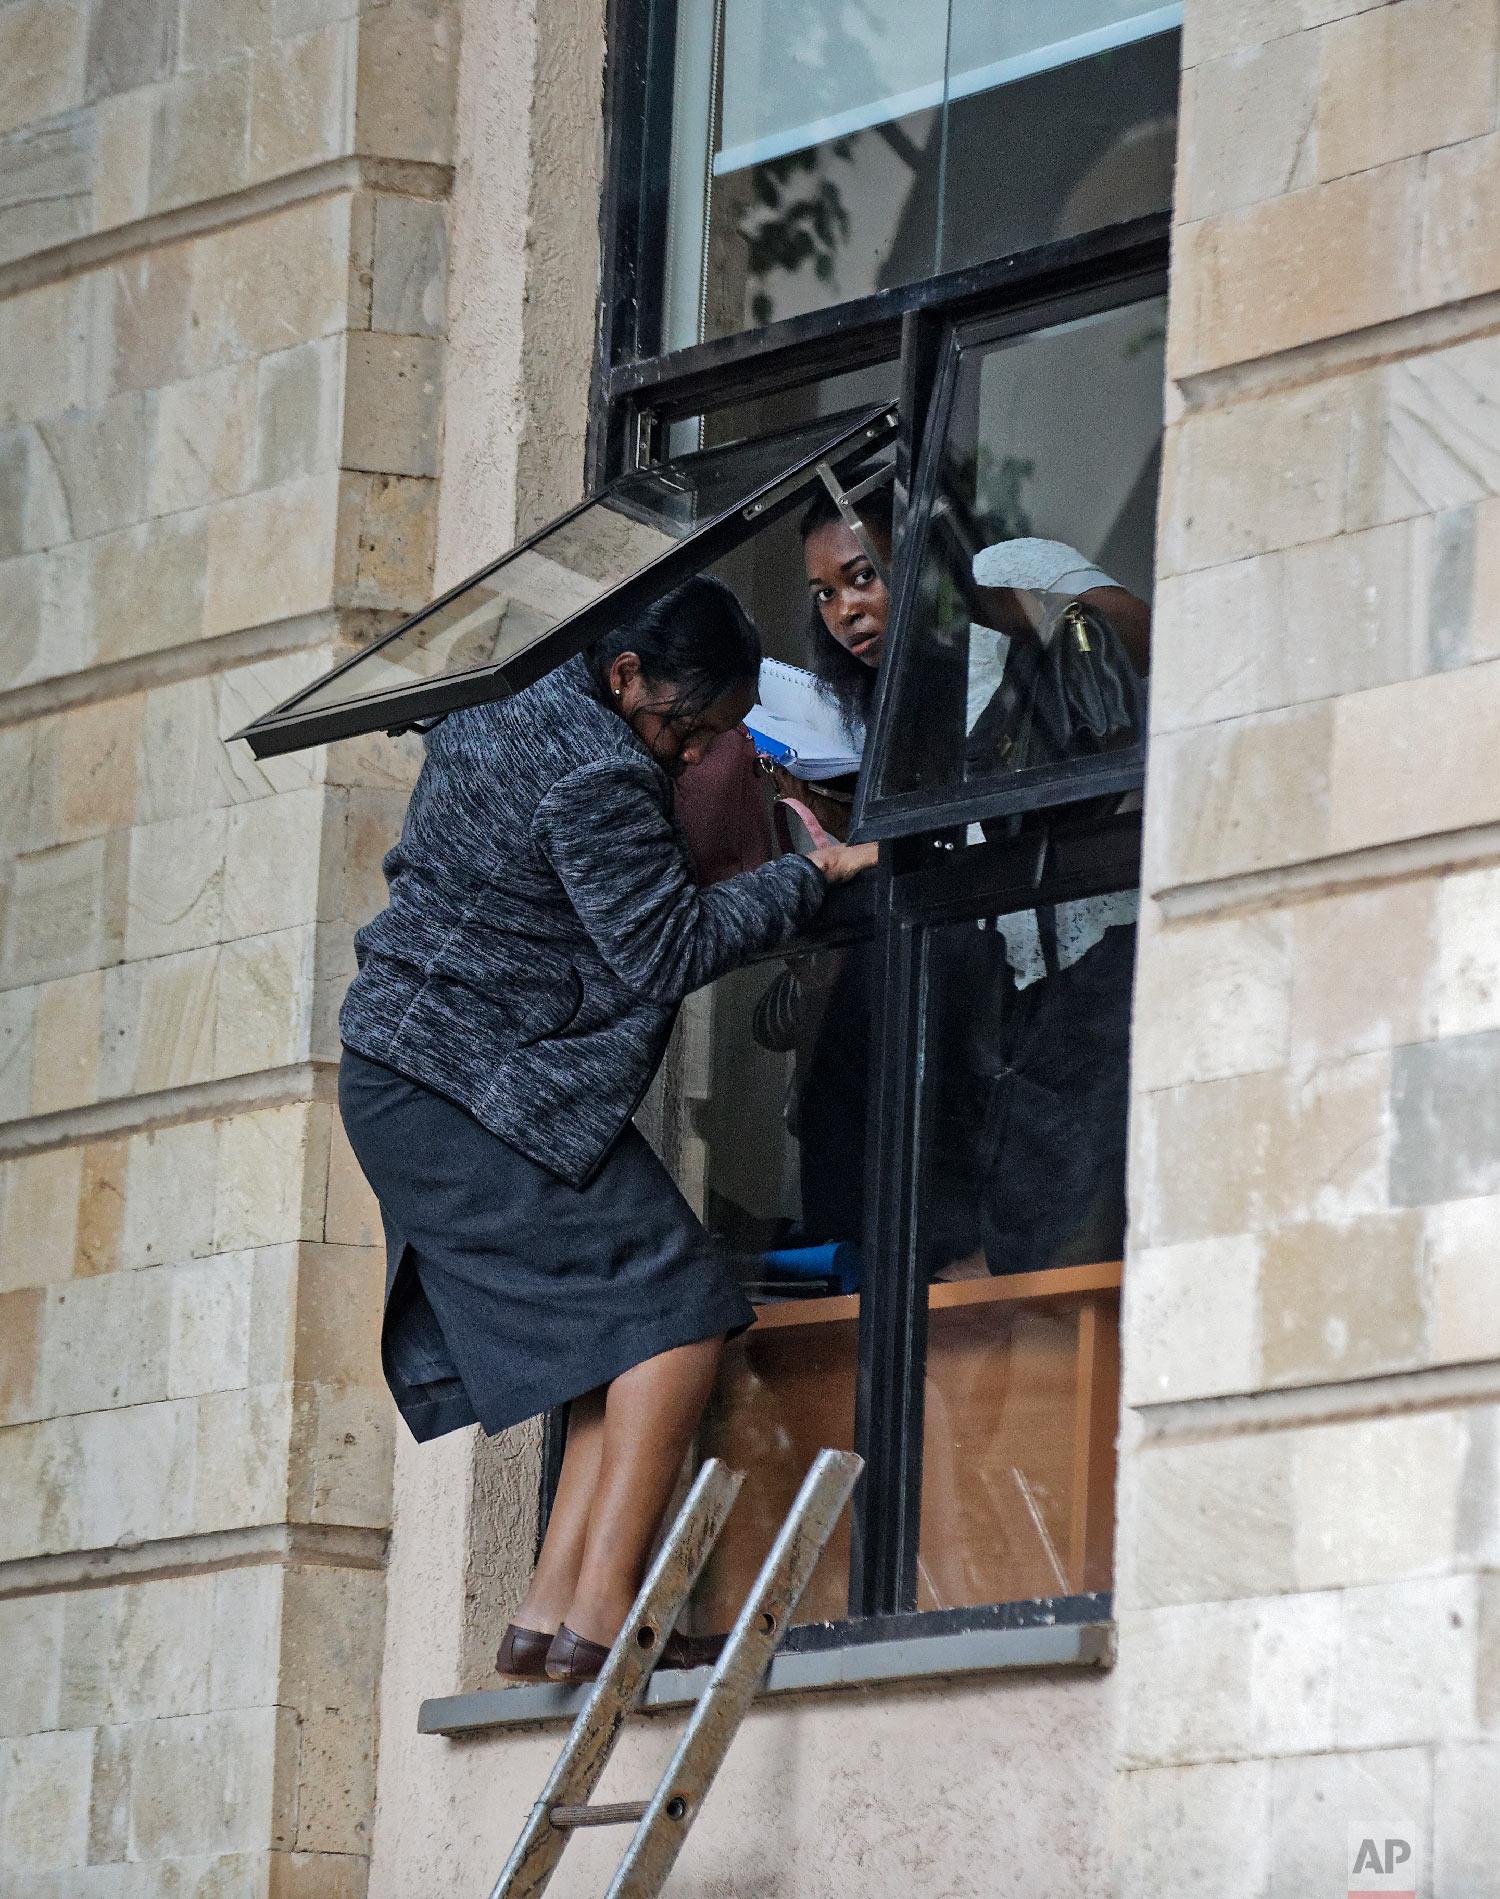 Civilians flee through a window at a hotel complex in Nairobi, Kenya, Jan. 15, 2019. (AP Photo/Ben Curtis)